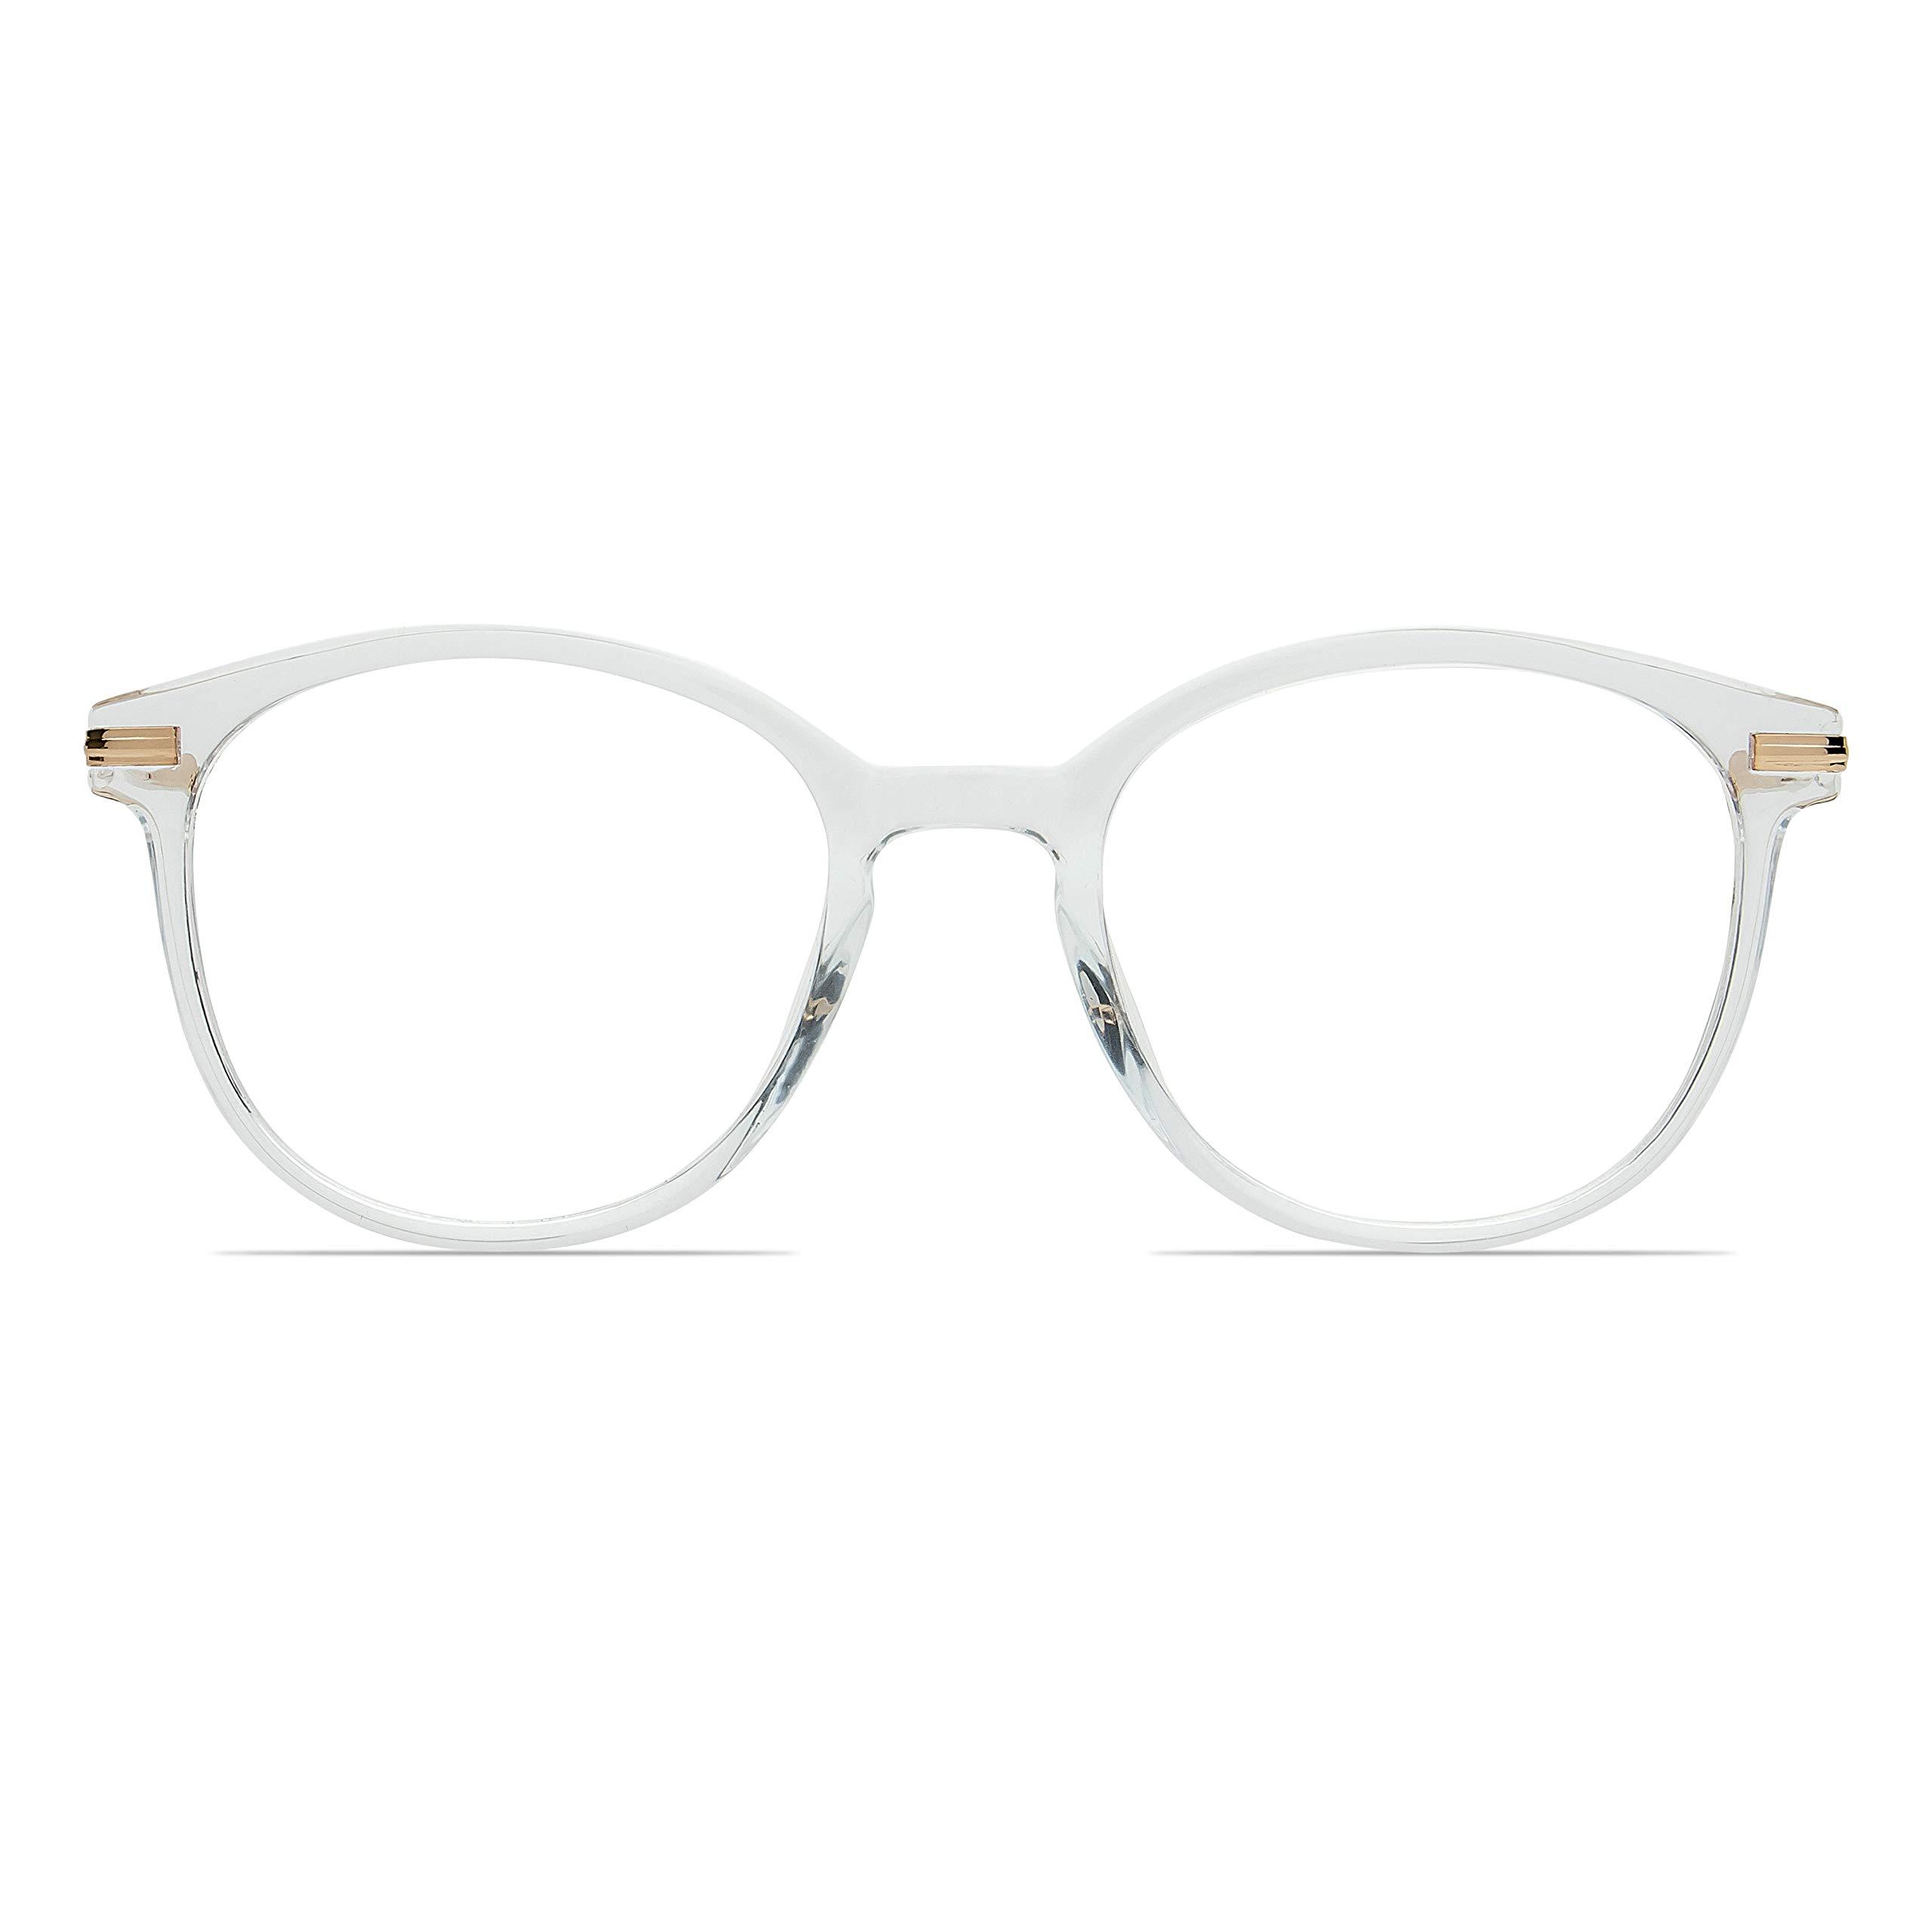 Blue Light Blocking Glasses Transparent Eyeglasses Frame Anti Blue Ray Computer Game Glasses